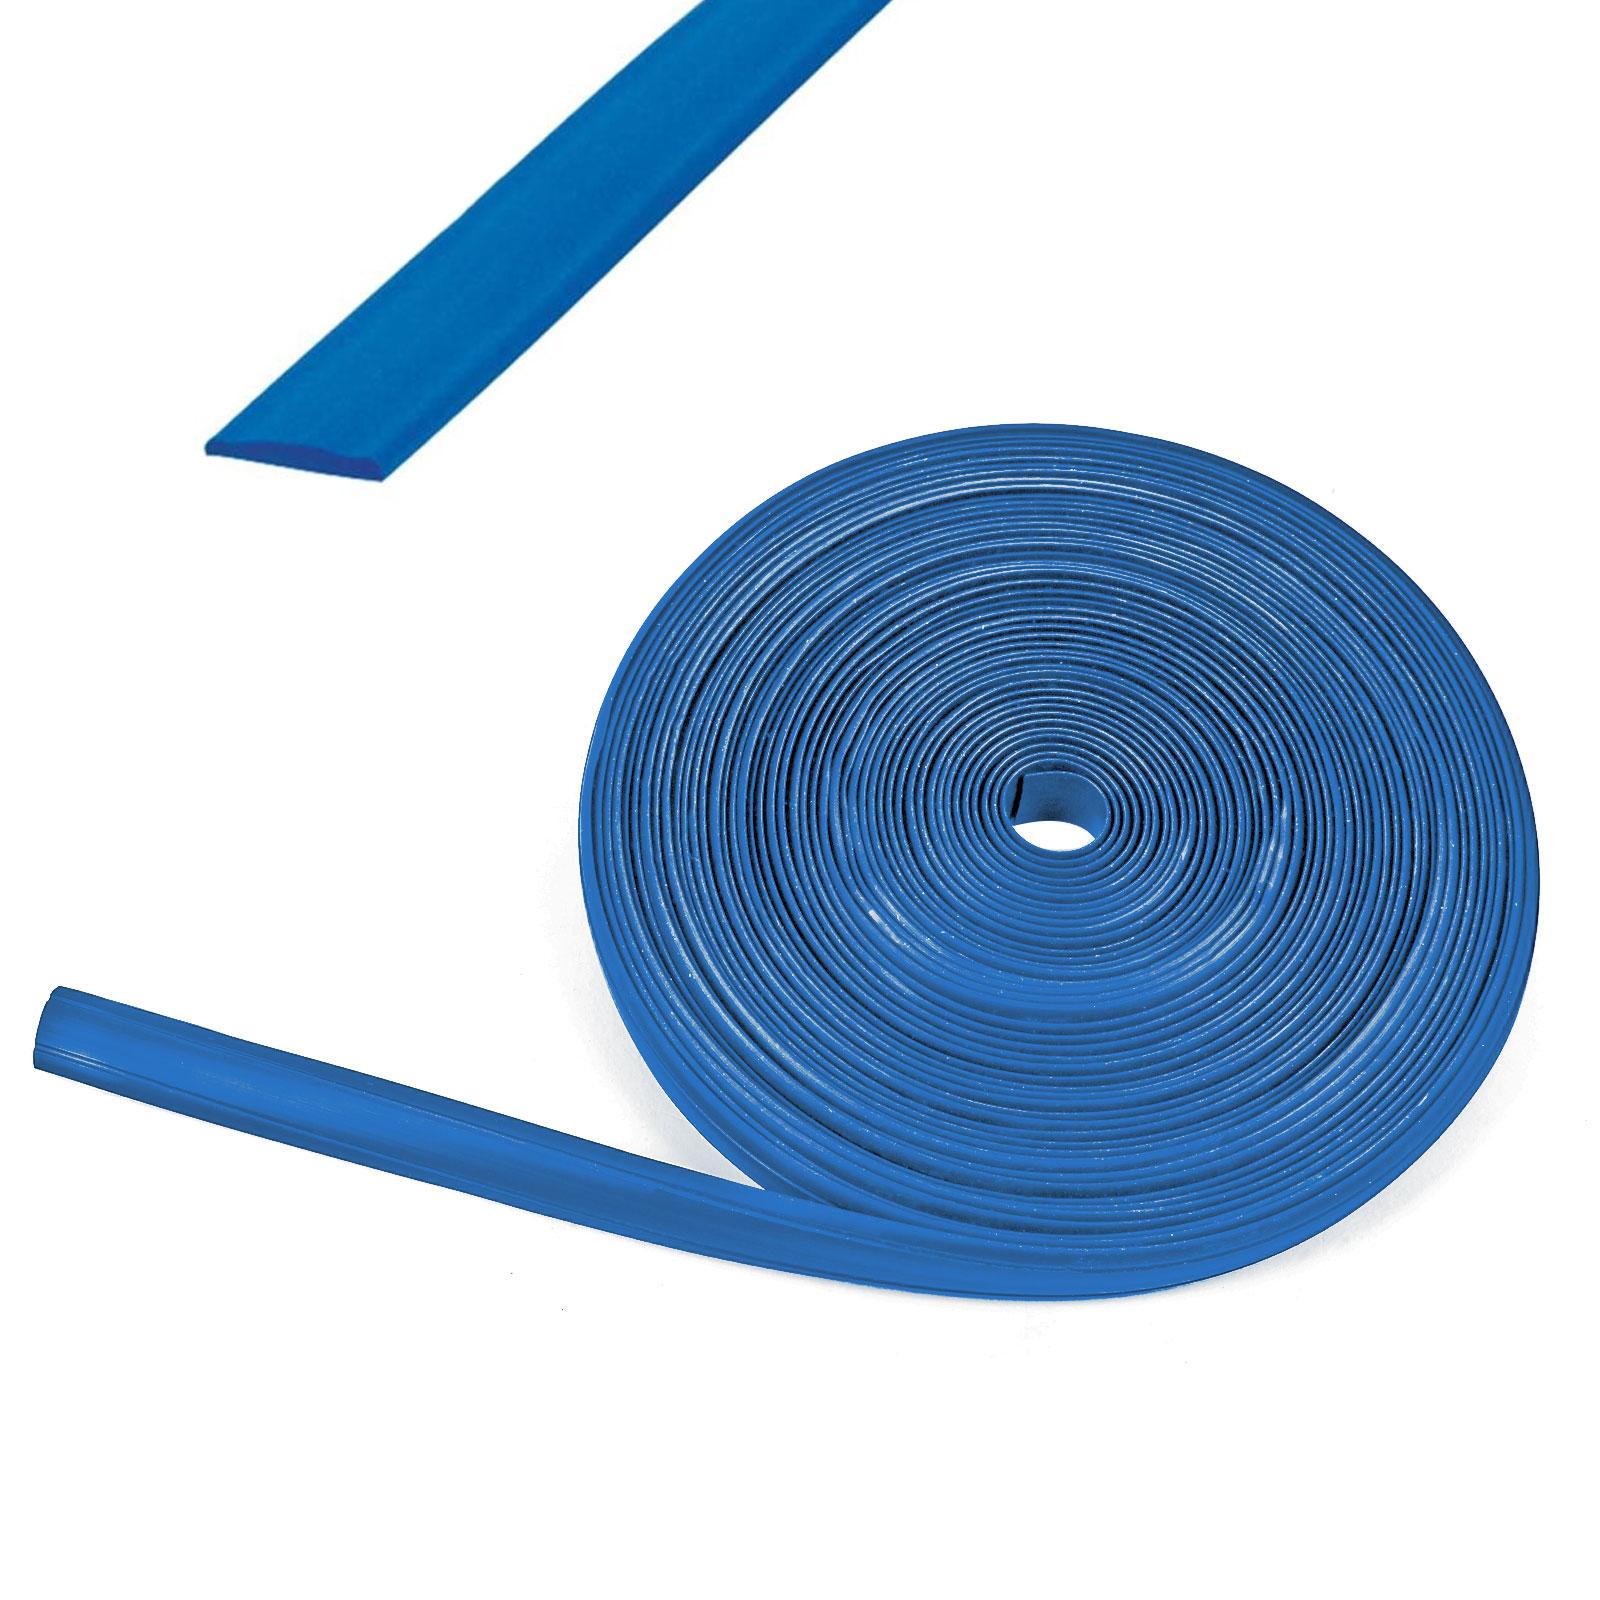 30 Meter (3x10 m) Kederband 12 mm blau Kunststoff Leistenfüller